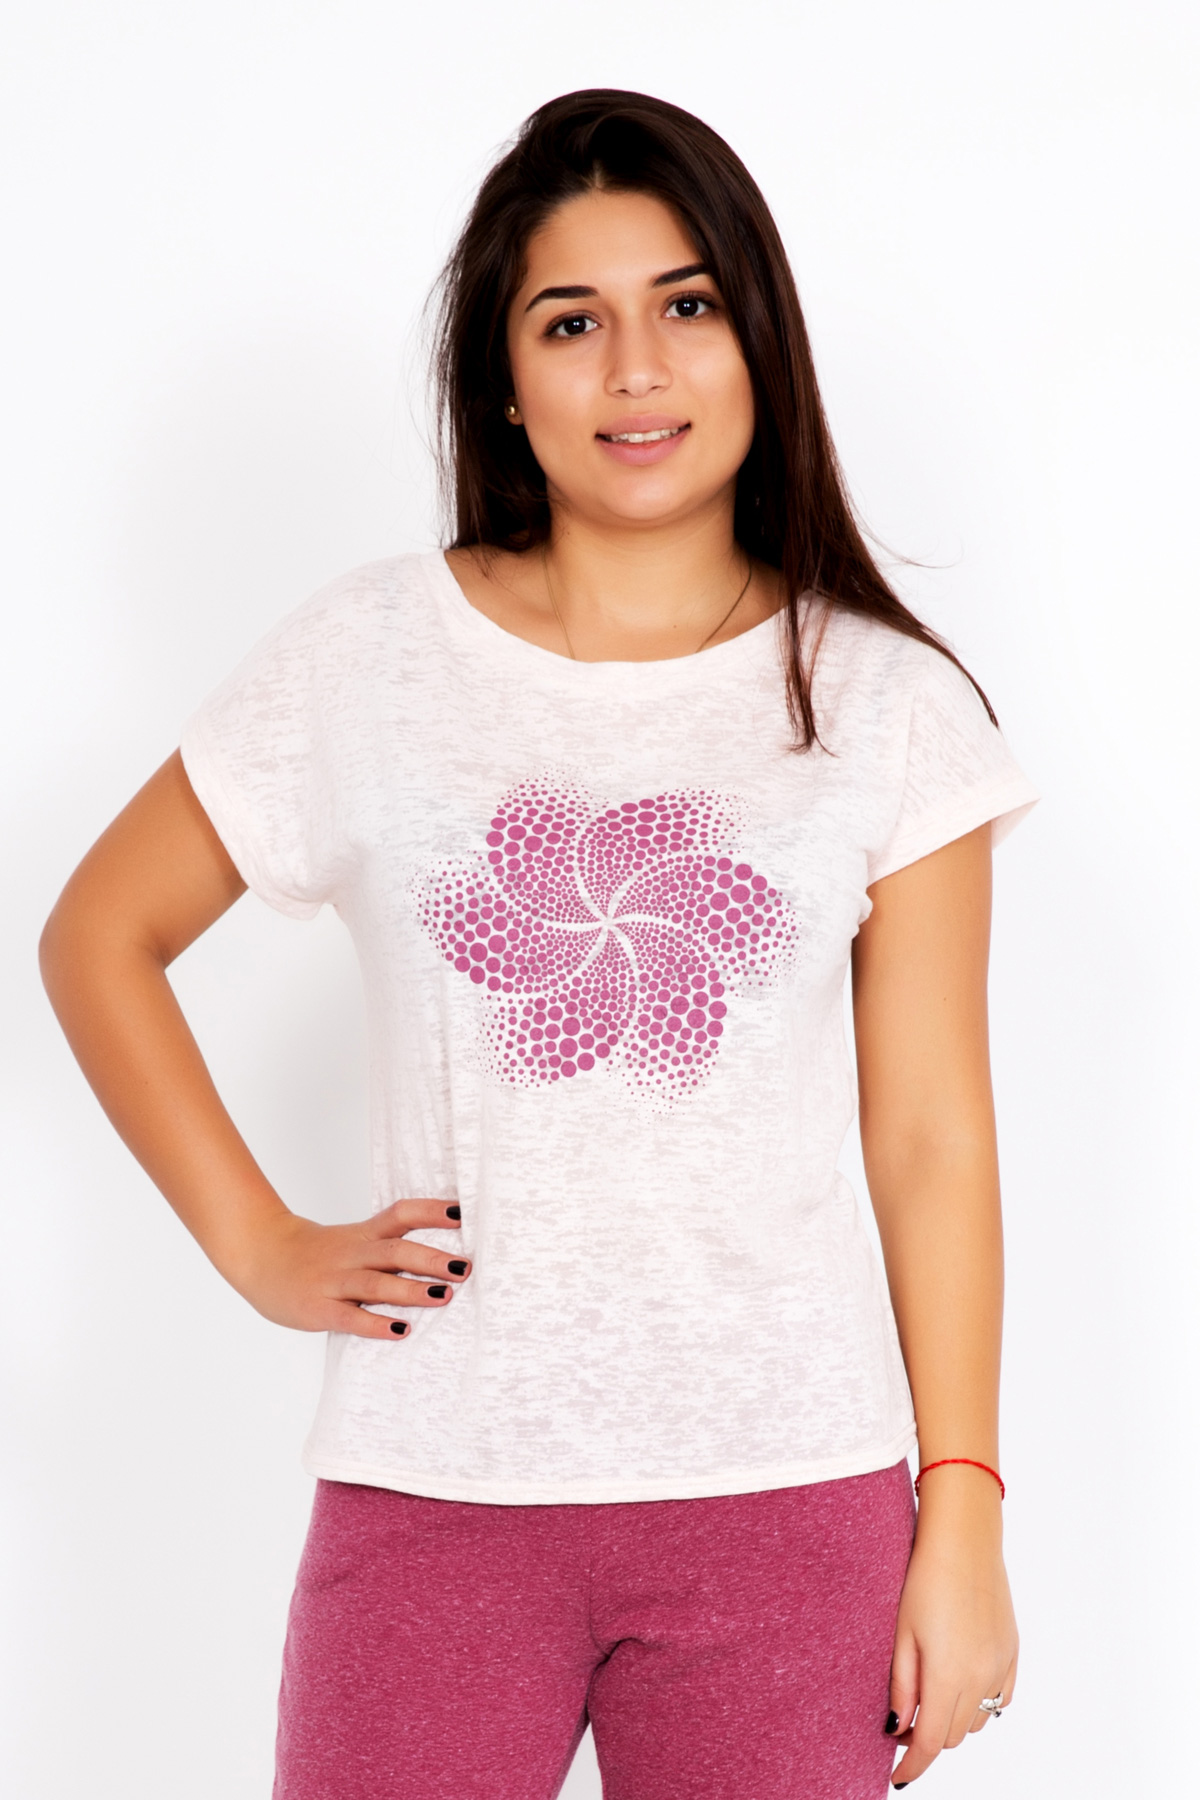 Жен. футболка Мадина р. 46Майки и футболки<br>Факт. ОГ: 94 см <br>Факт. ОТ: 90 см <br>Факт. ОБ: 96 см <br>Длина по спинке: 60 см<br><br>Тип: Жен. футболка<br>Размер: 46<br>Материал: Деворе